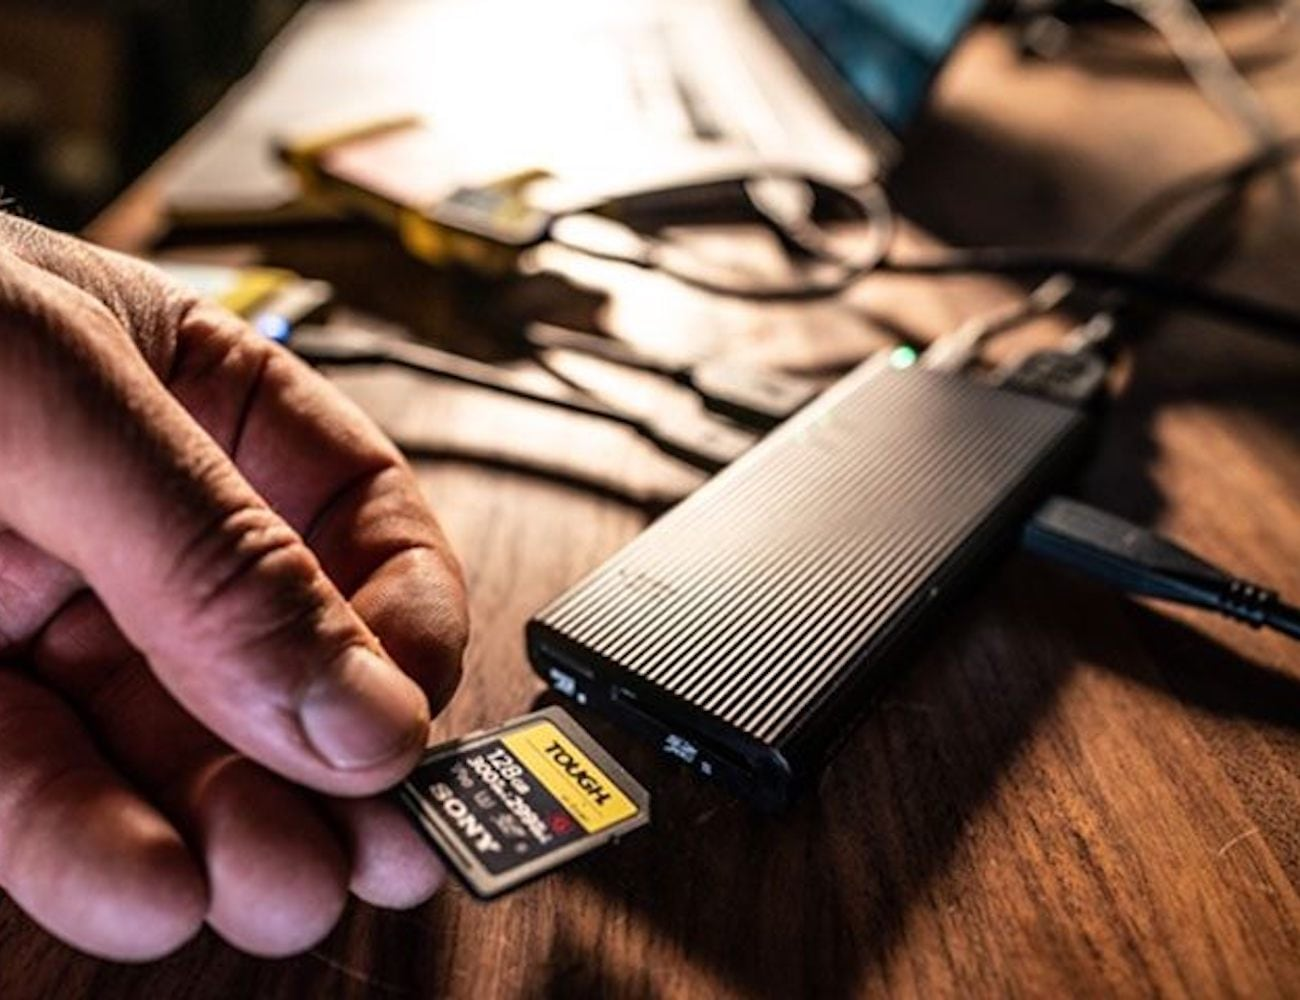 Sony MRW-S3 USB Hub transfers data incredibly fast